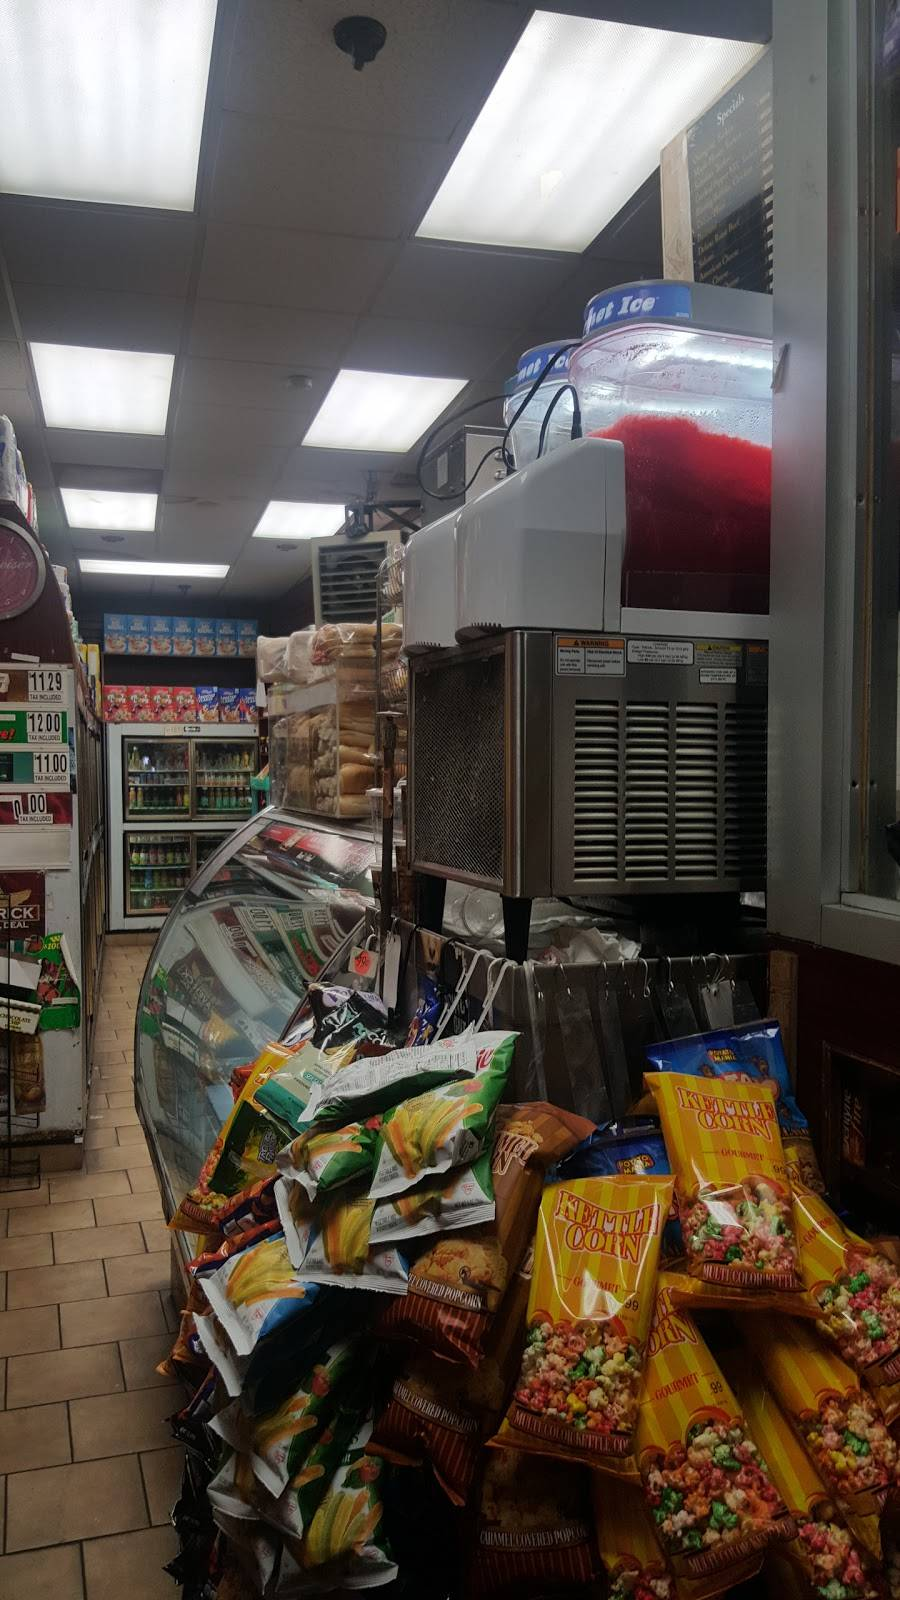 Friendship Deli Grocery   restaurant   1043 E 163rd St, Bronx, NY 10459, USA   3472718887 OR +1 347-271-8887